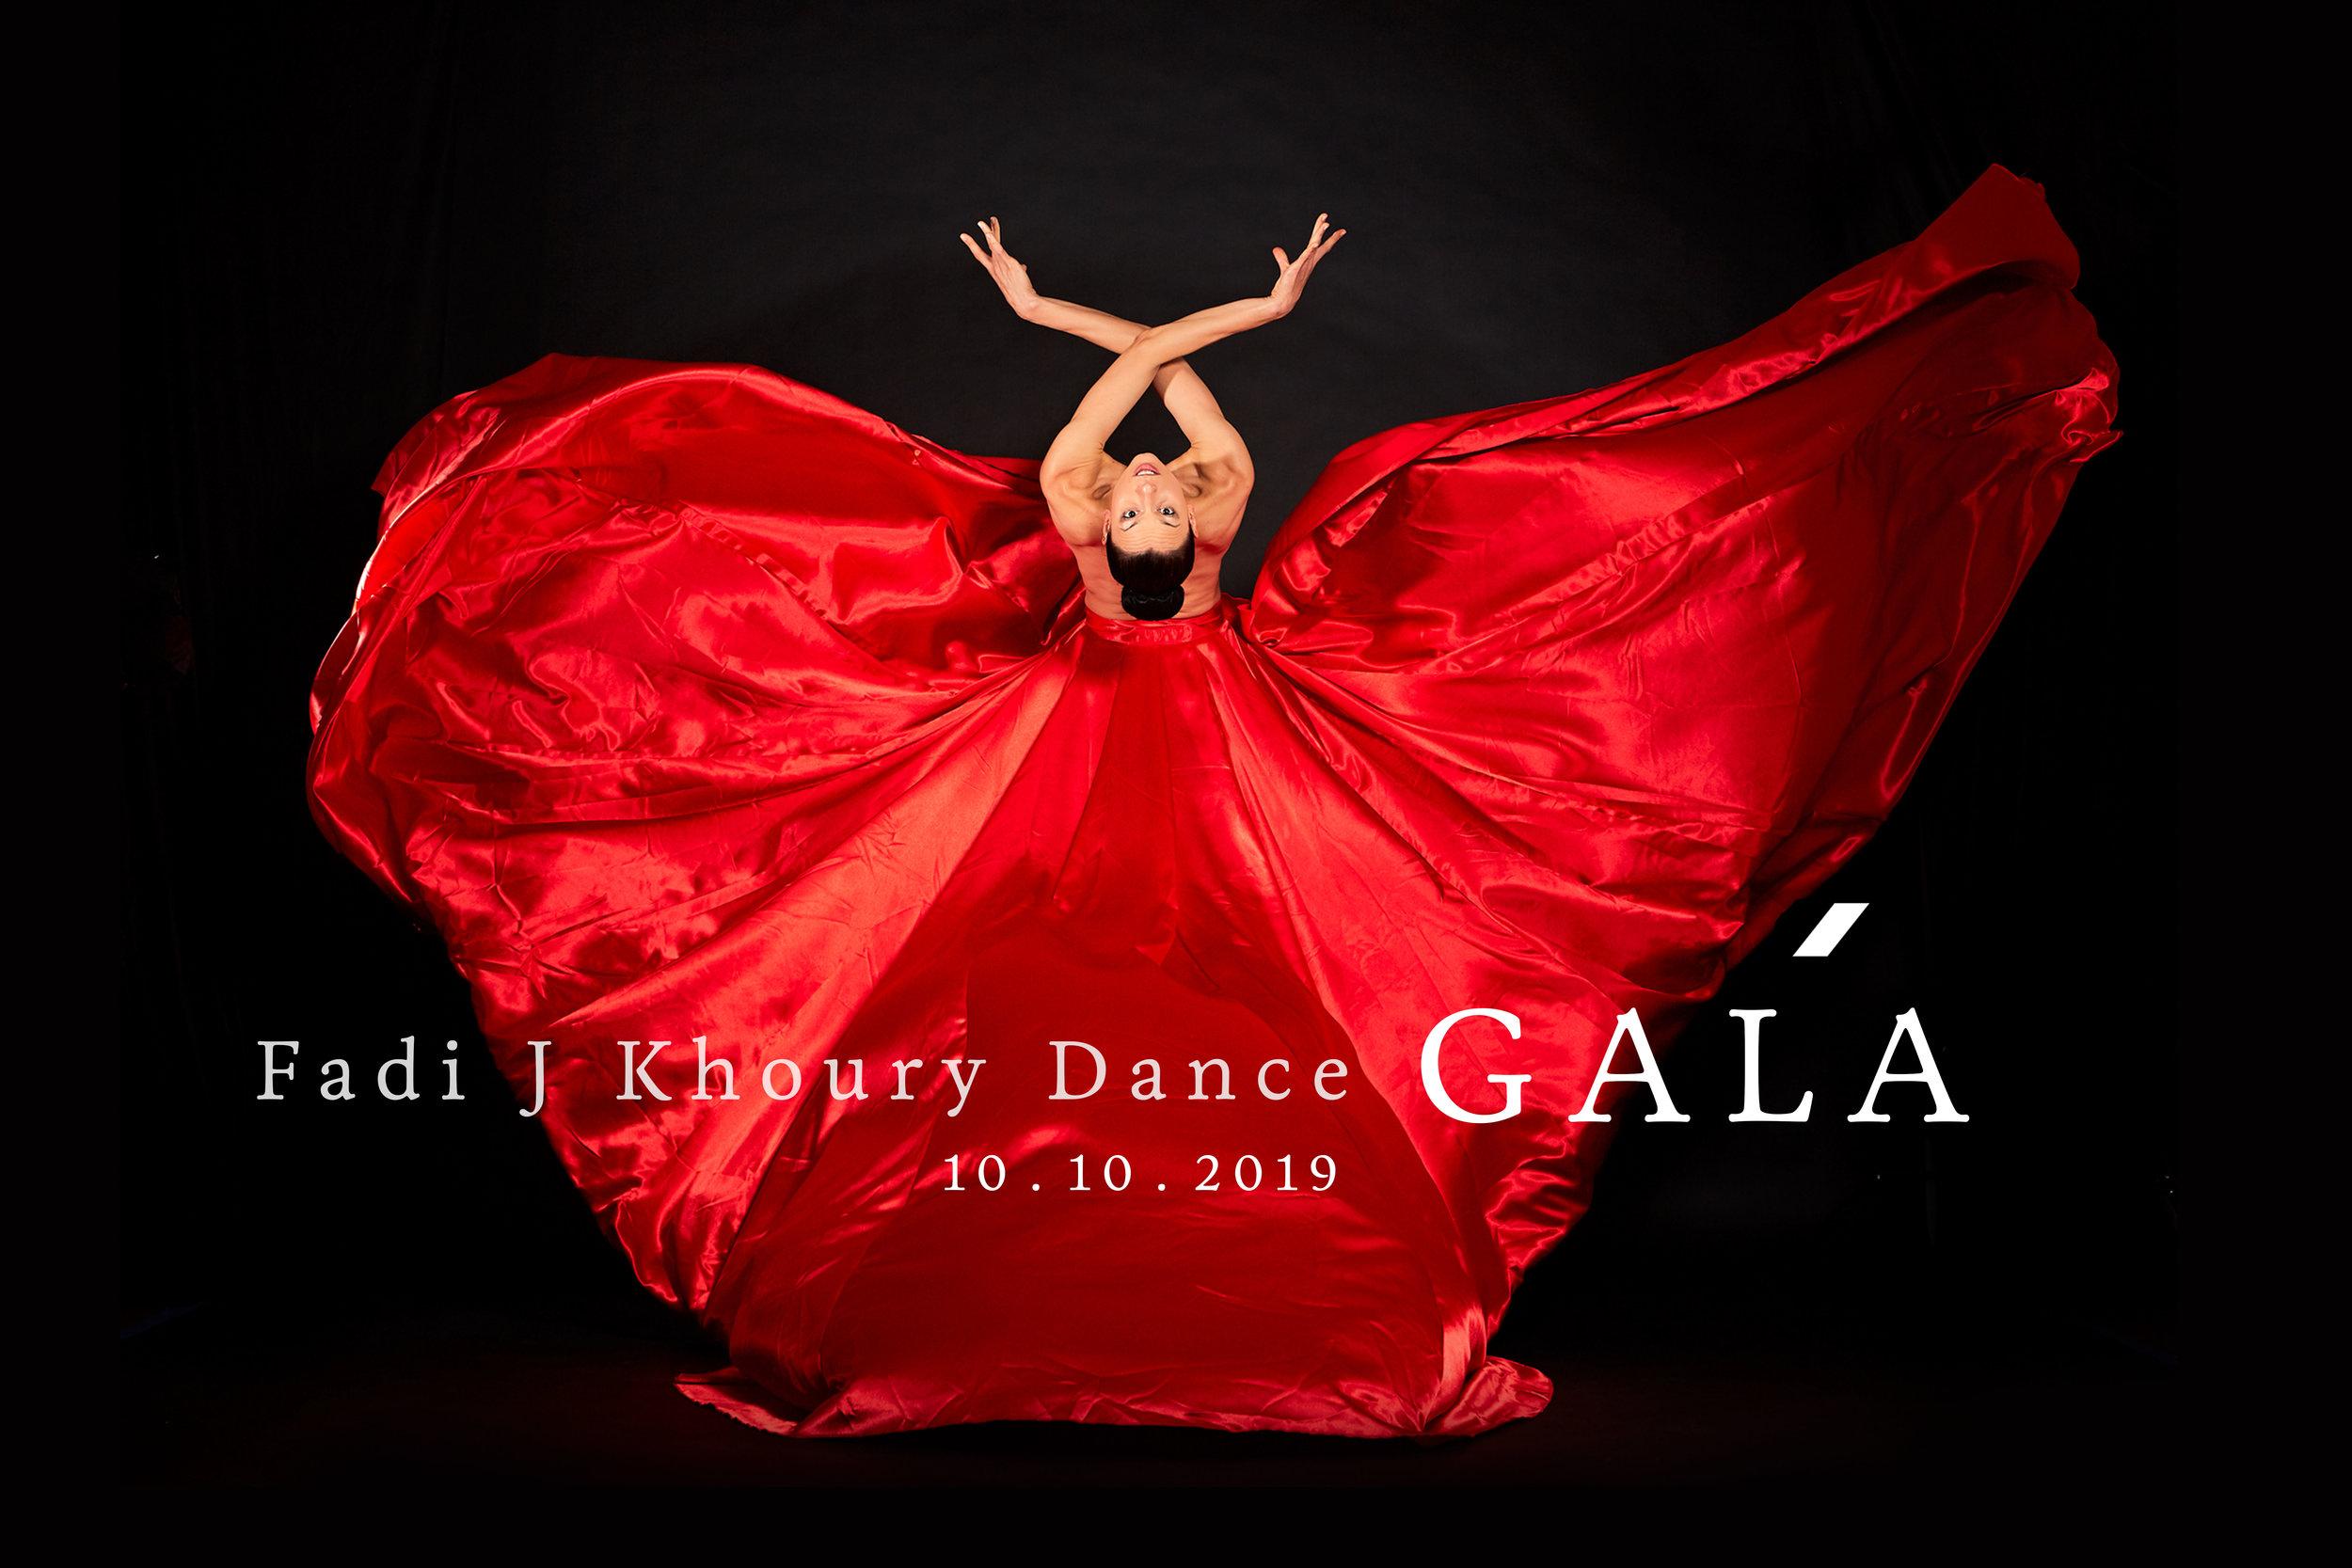 gala 2019 invitation front.jpg